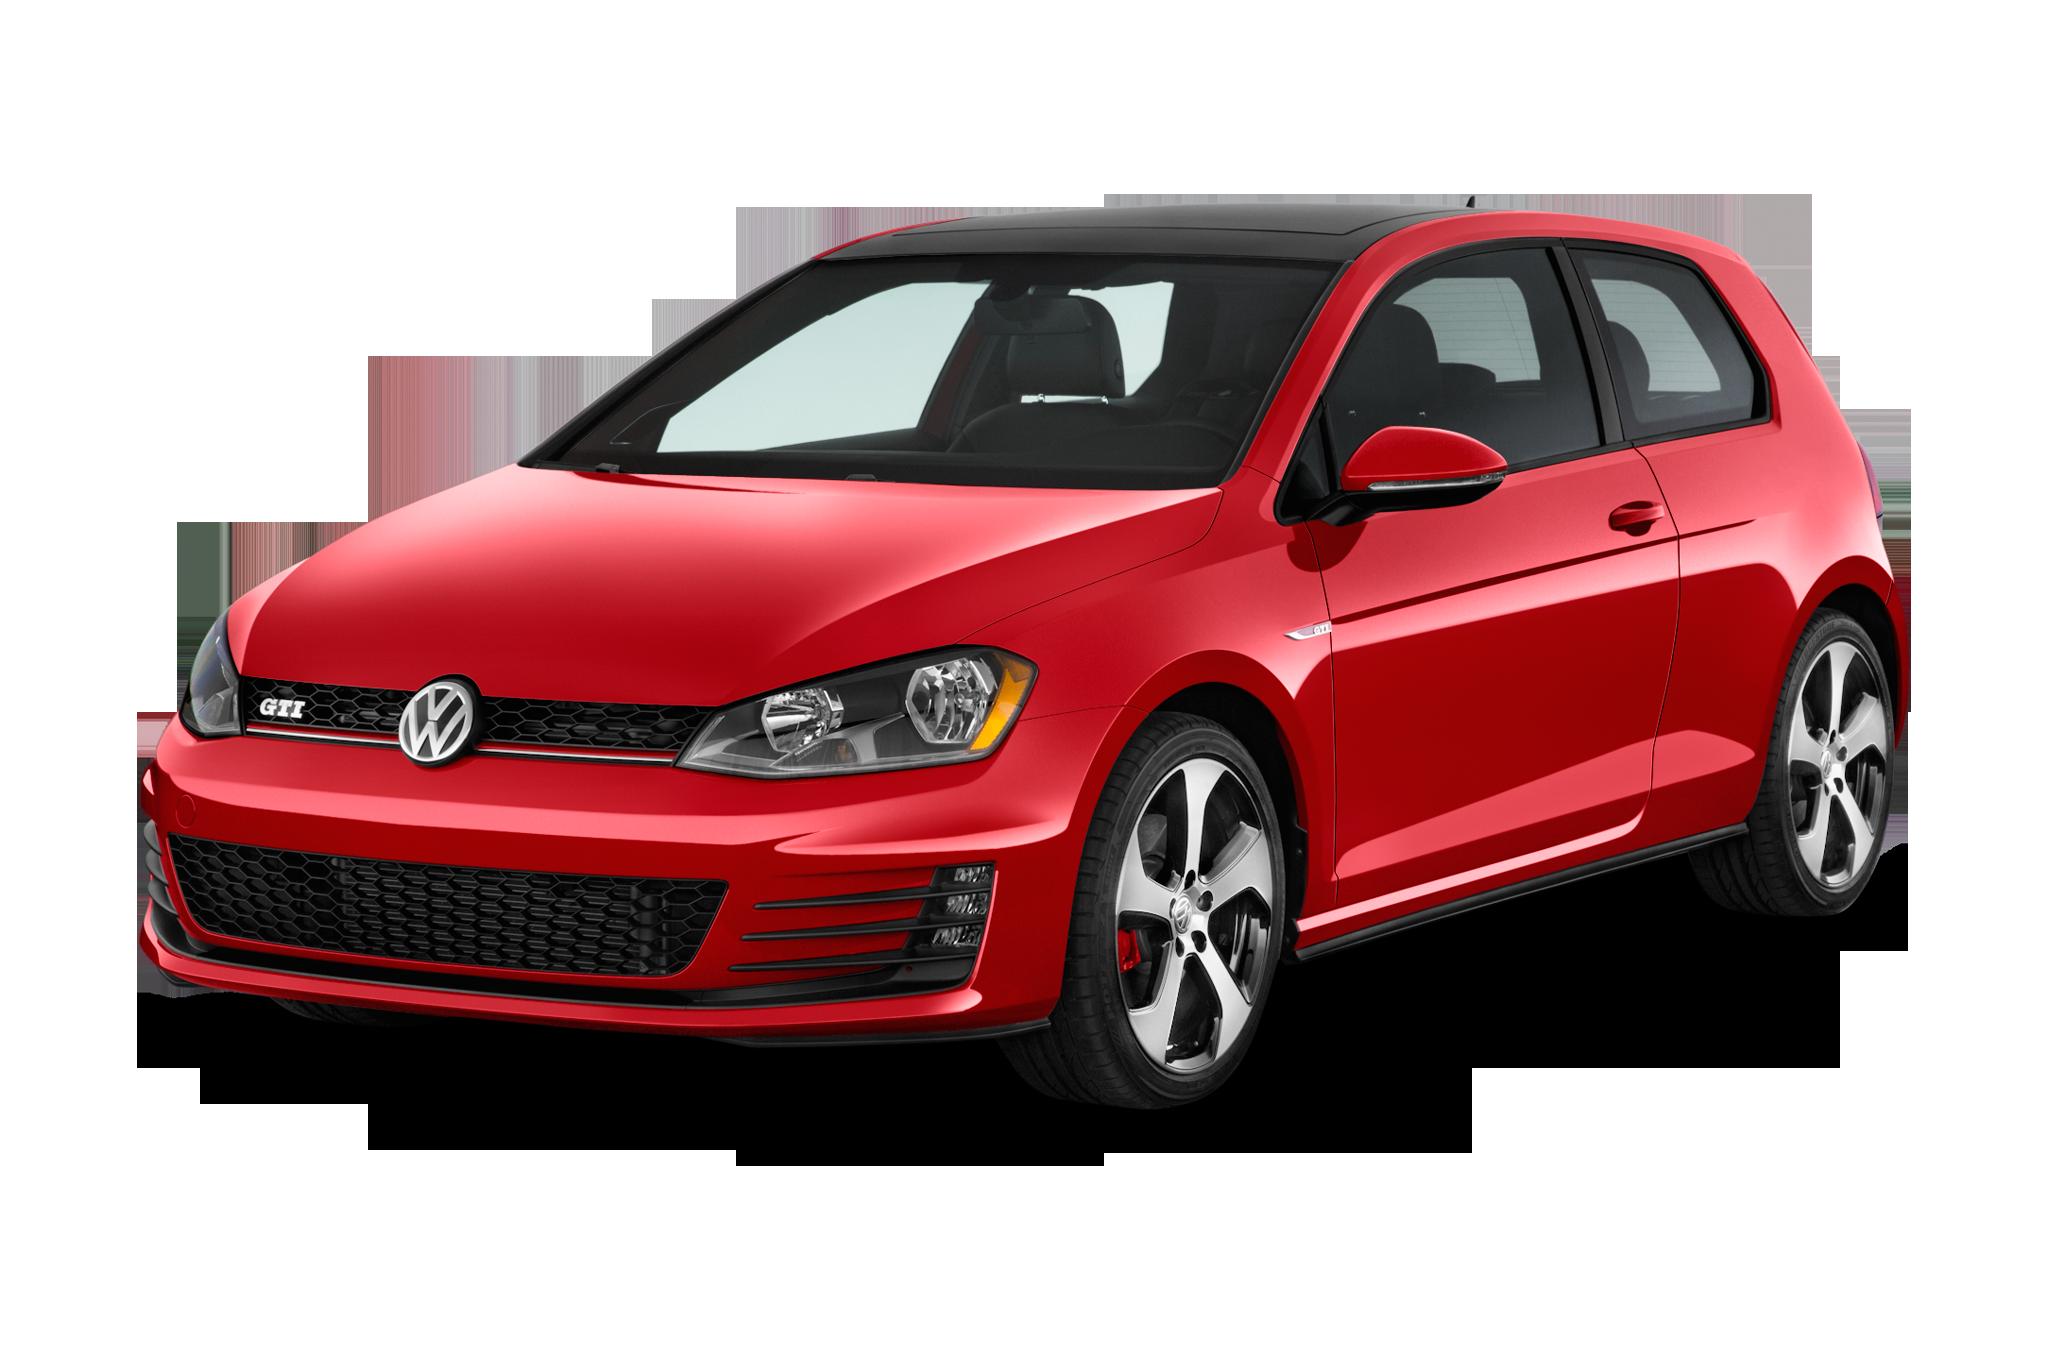 volkswagen golf gti 2015 automobile all star automobile magazine. Black Bedroom Furniture Sets. Home Design Ideas